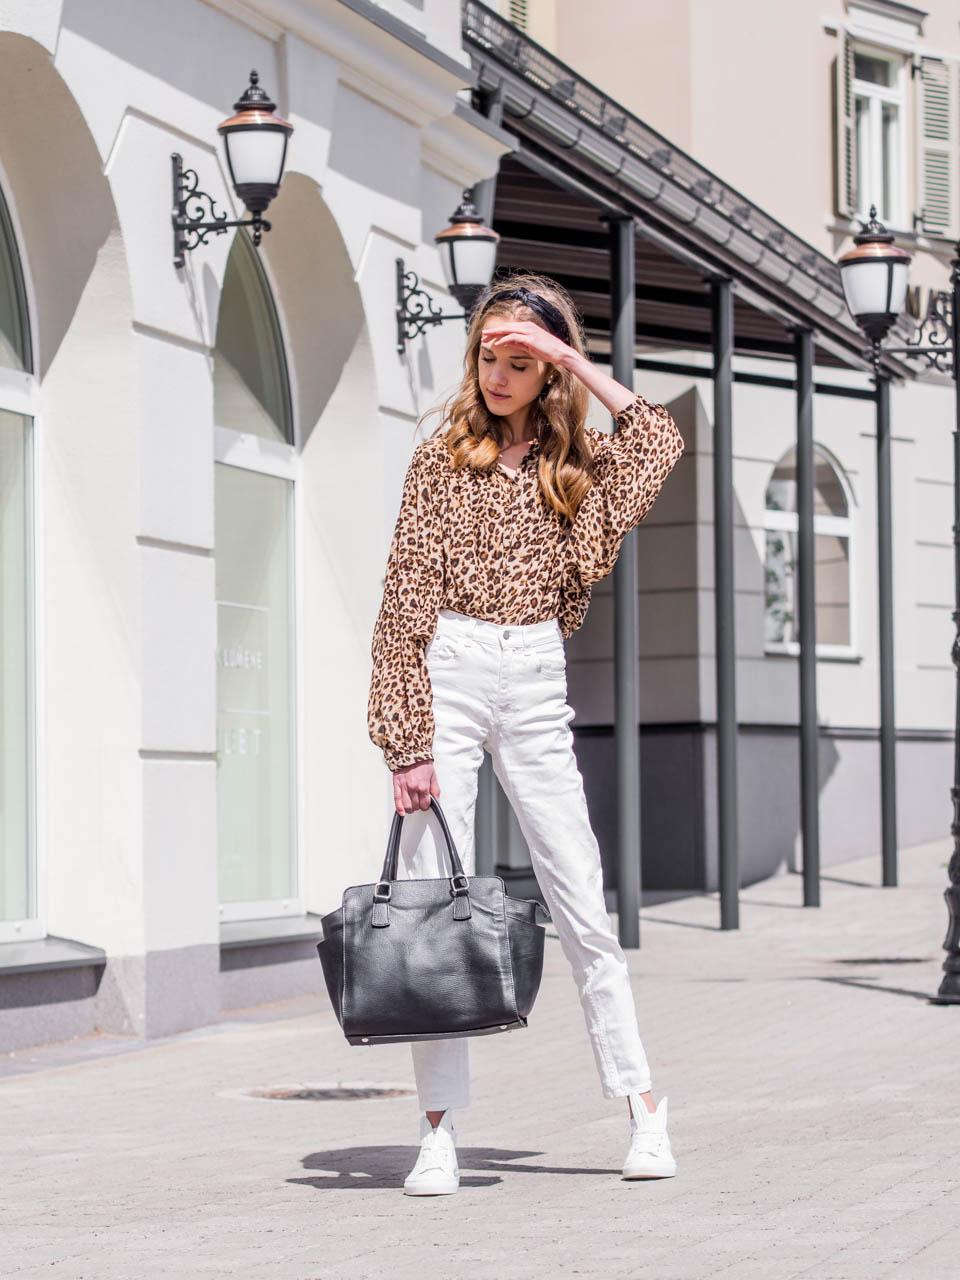 fashion-blogger-photoshoot-behind-the-scenes-outfit-with-white-denim-leopard-blouse-muotiblogi-asukuvat-valkoiset-farkut-leopardi-paita